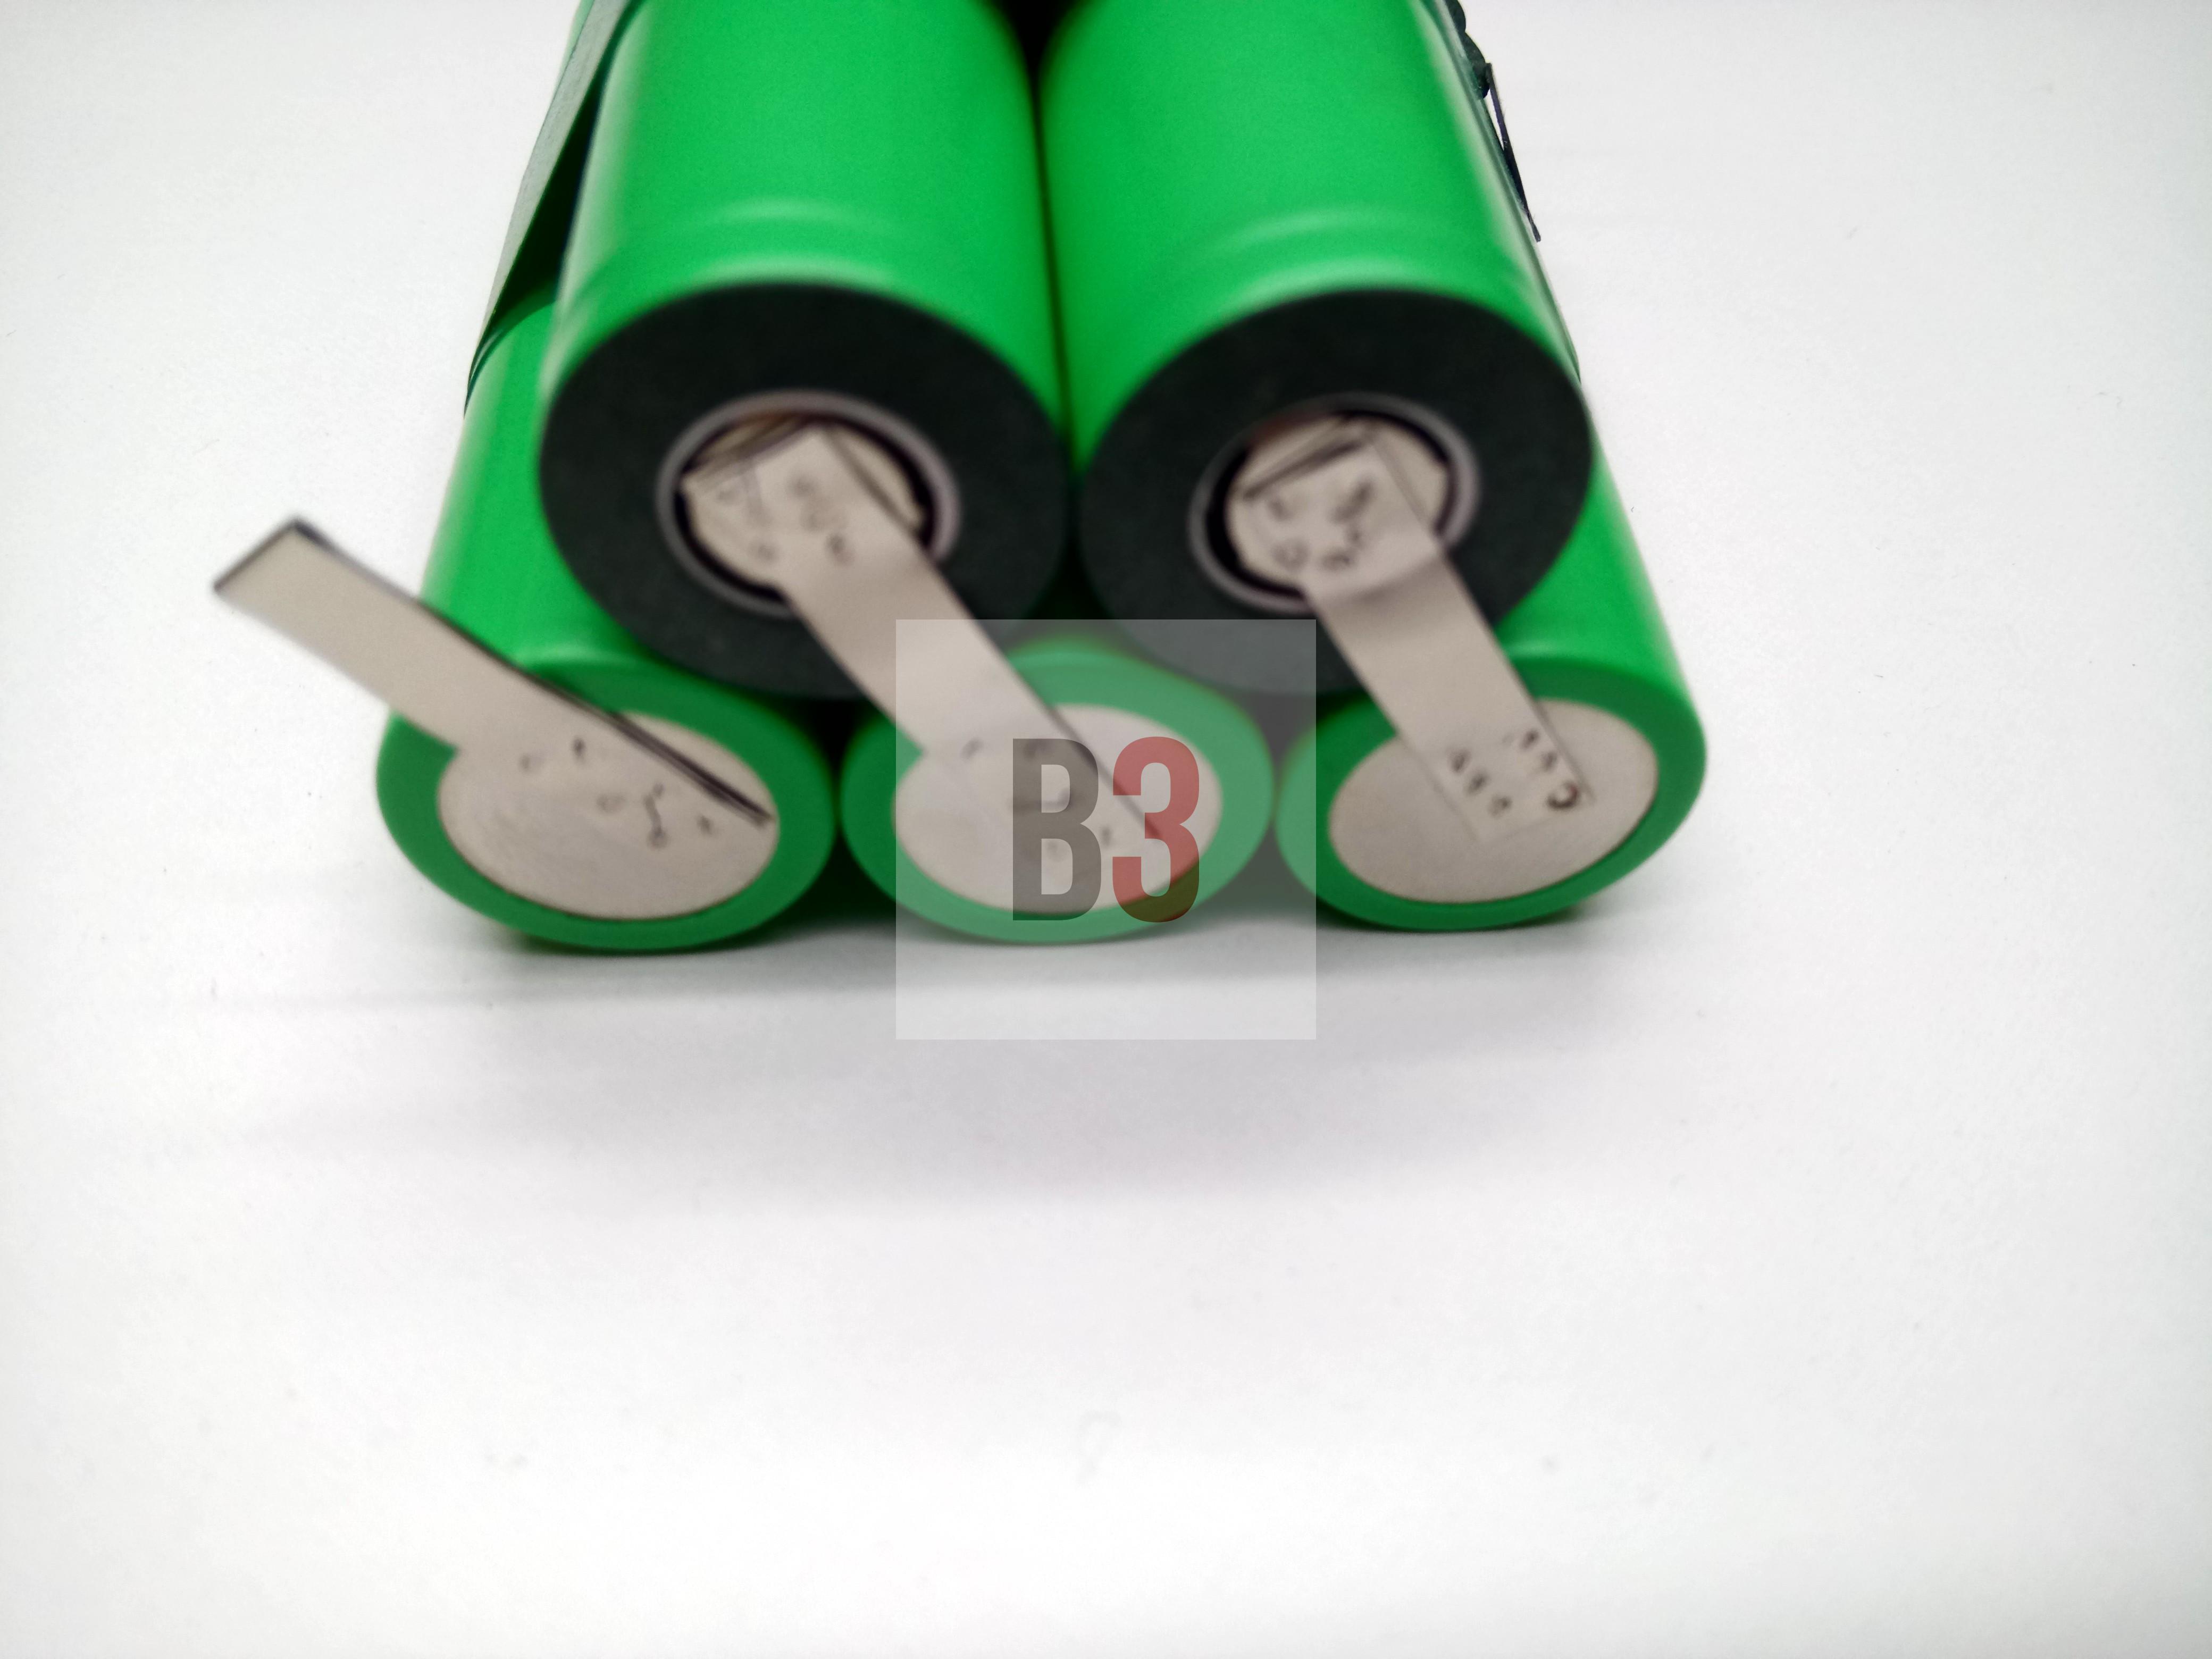 Комплект для переделки шуруповерта с Ni-Cd на Li-ion аккумуляторы